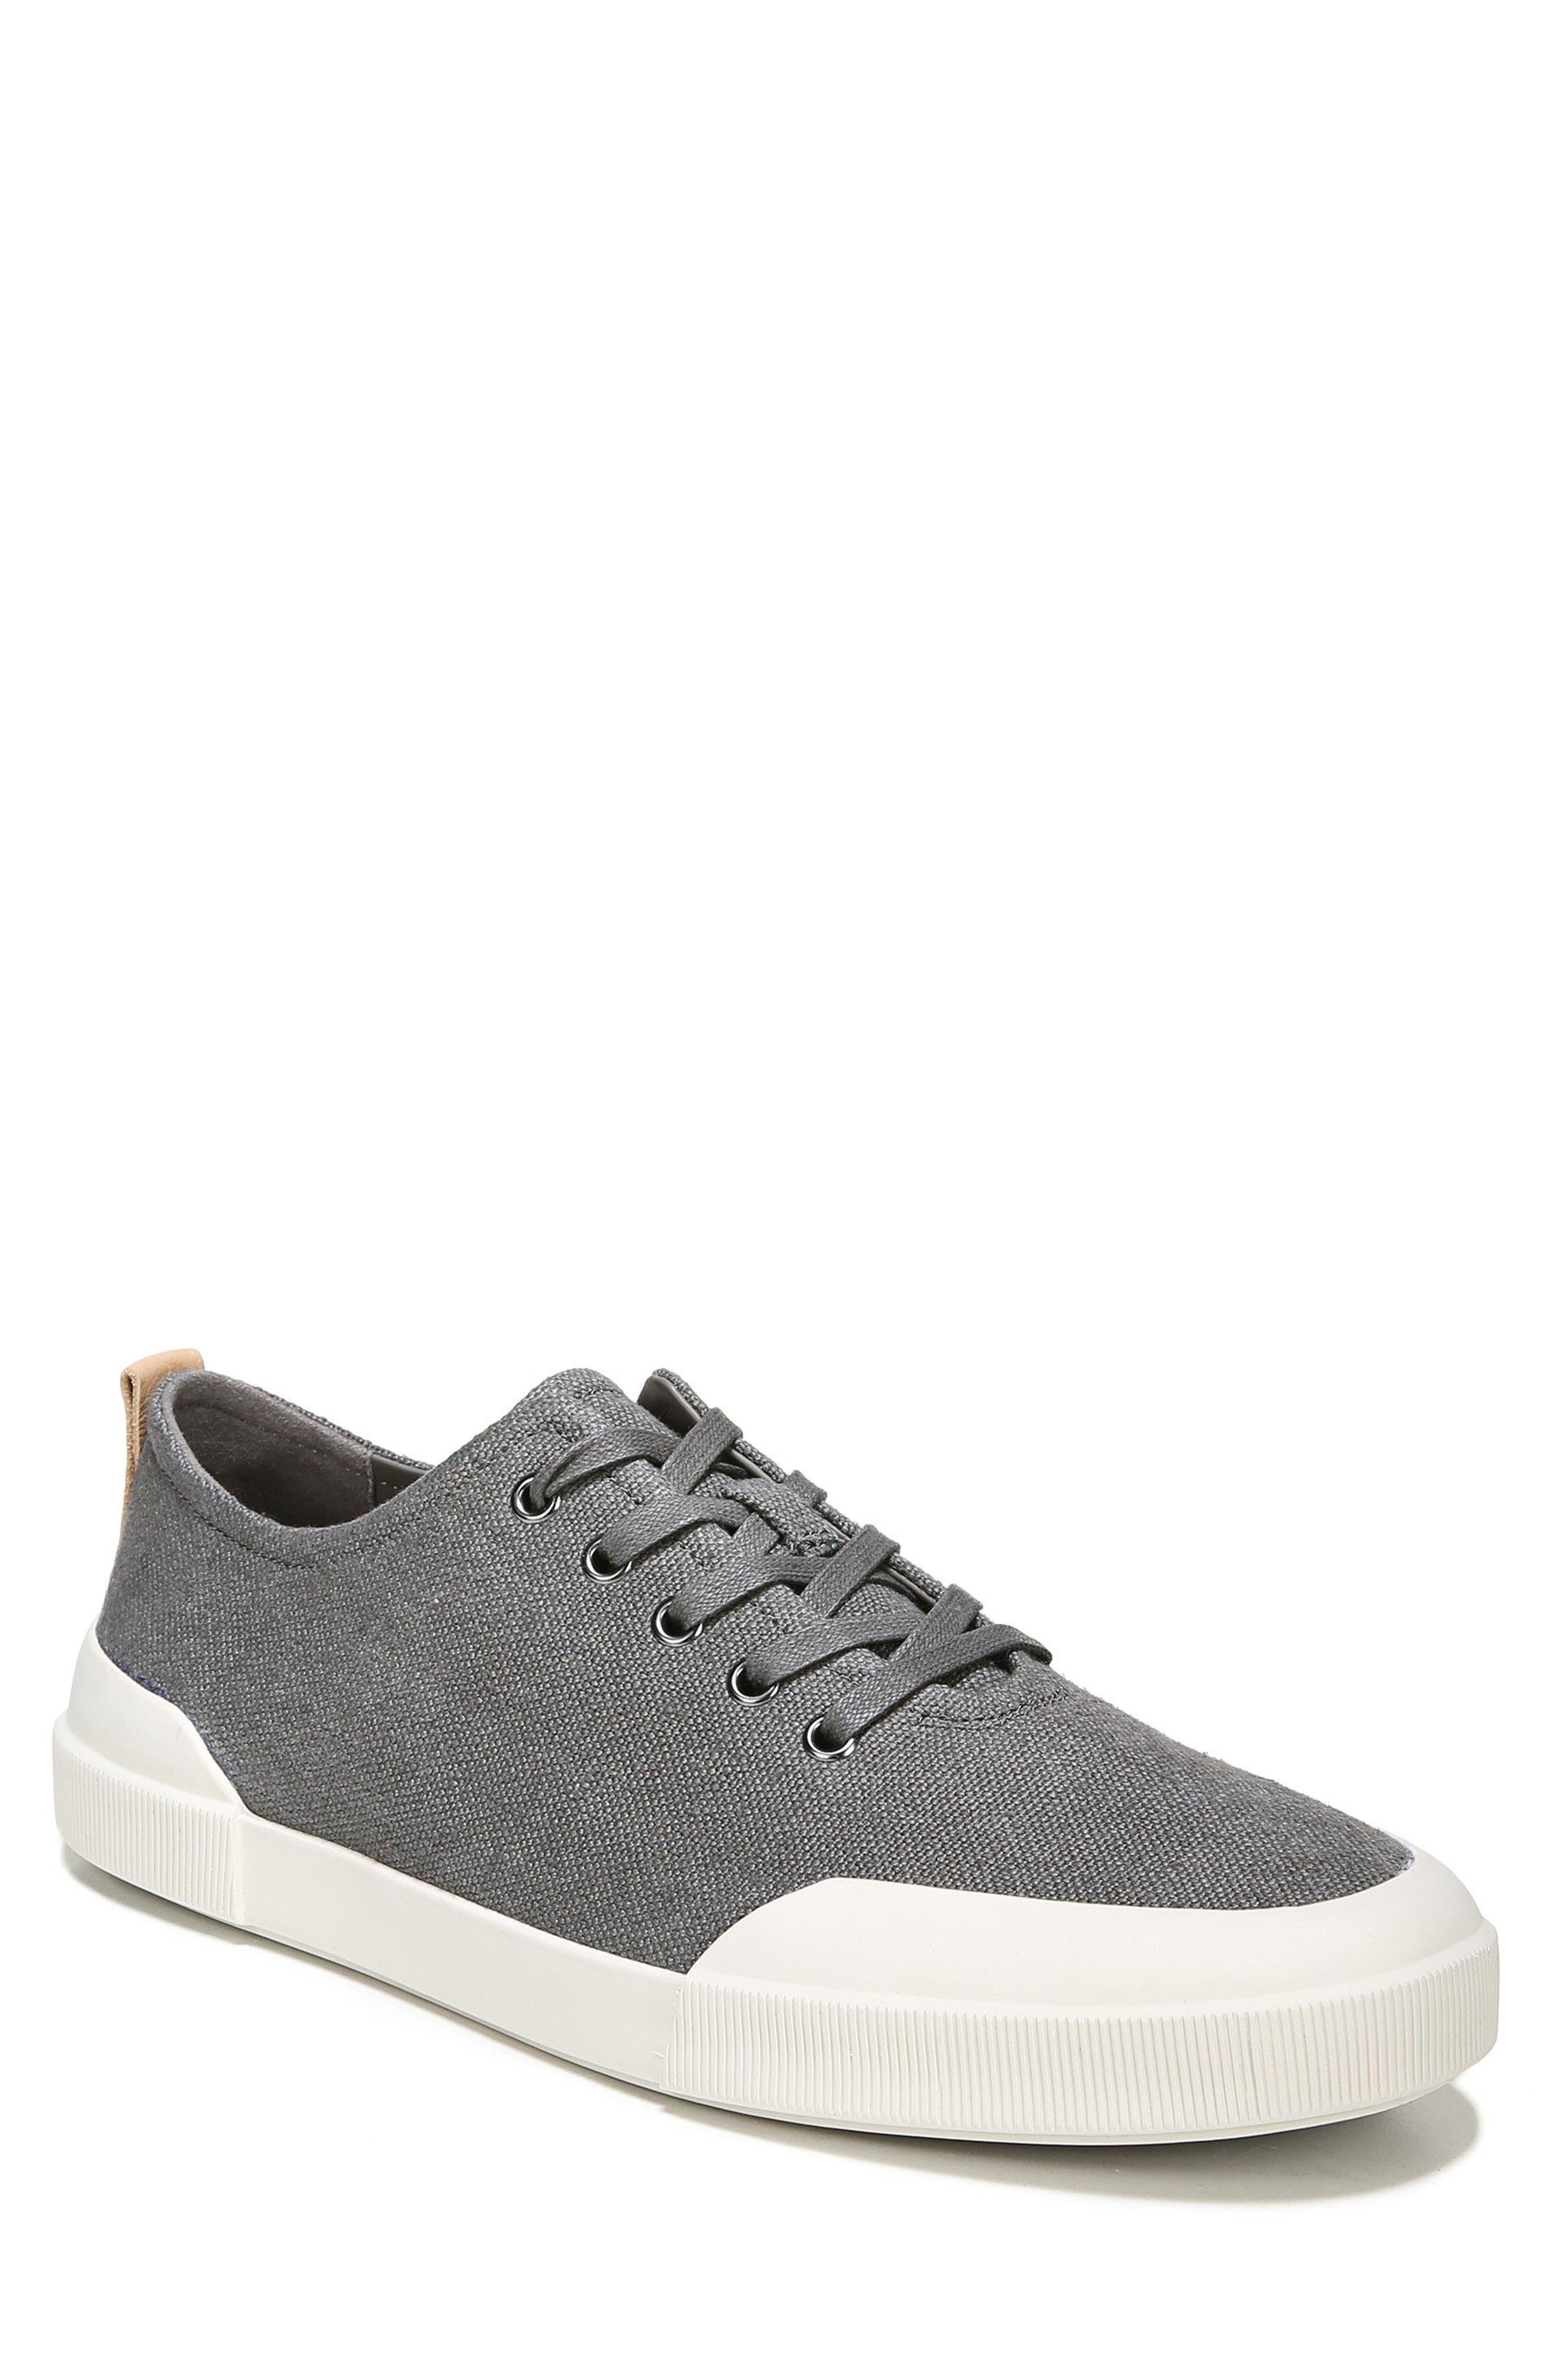 Victor Low Top Sneaker,                             Main thumbnail 1, color,                             020